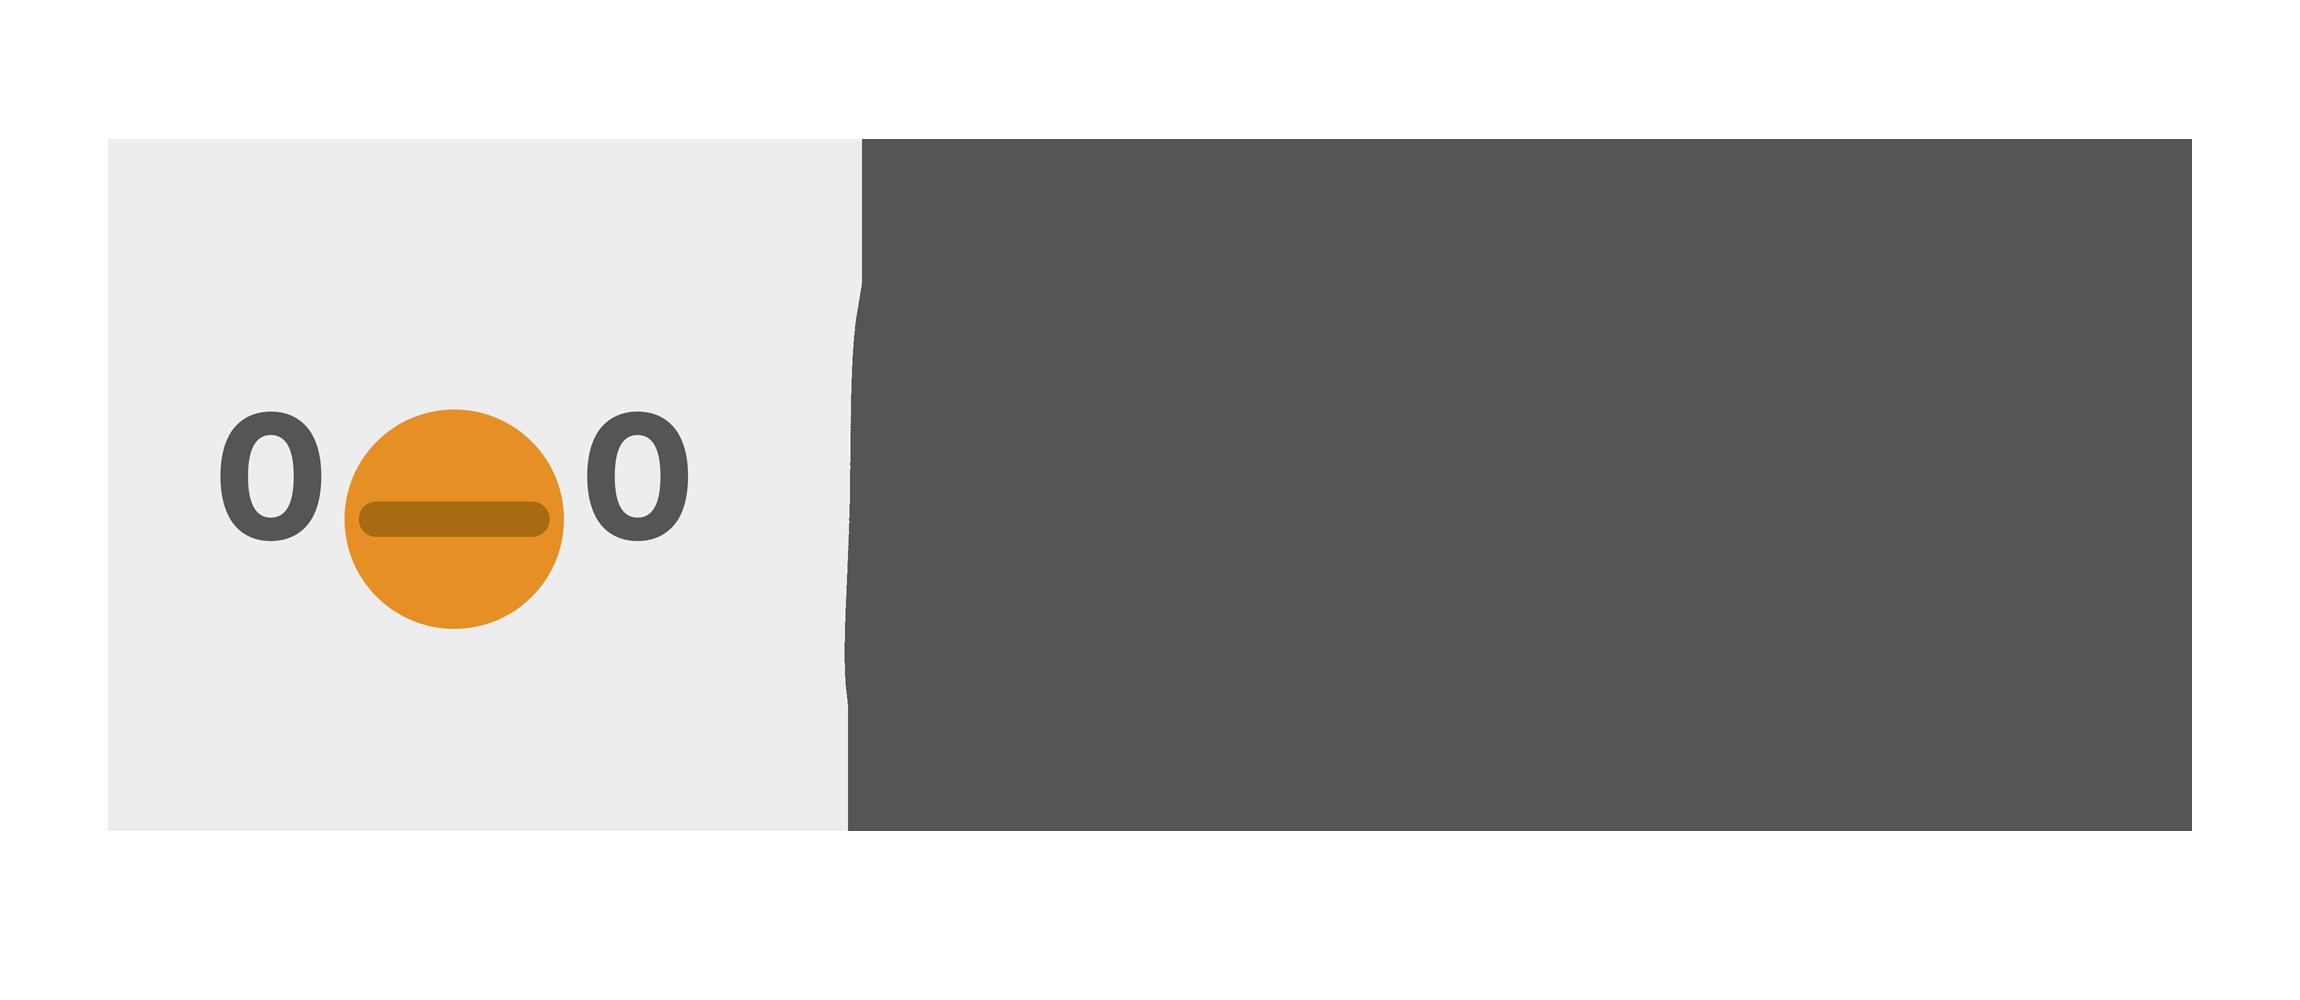 esa-logo__whitebg--transparent.png (72.7 kB)